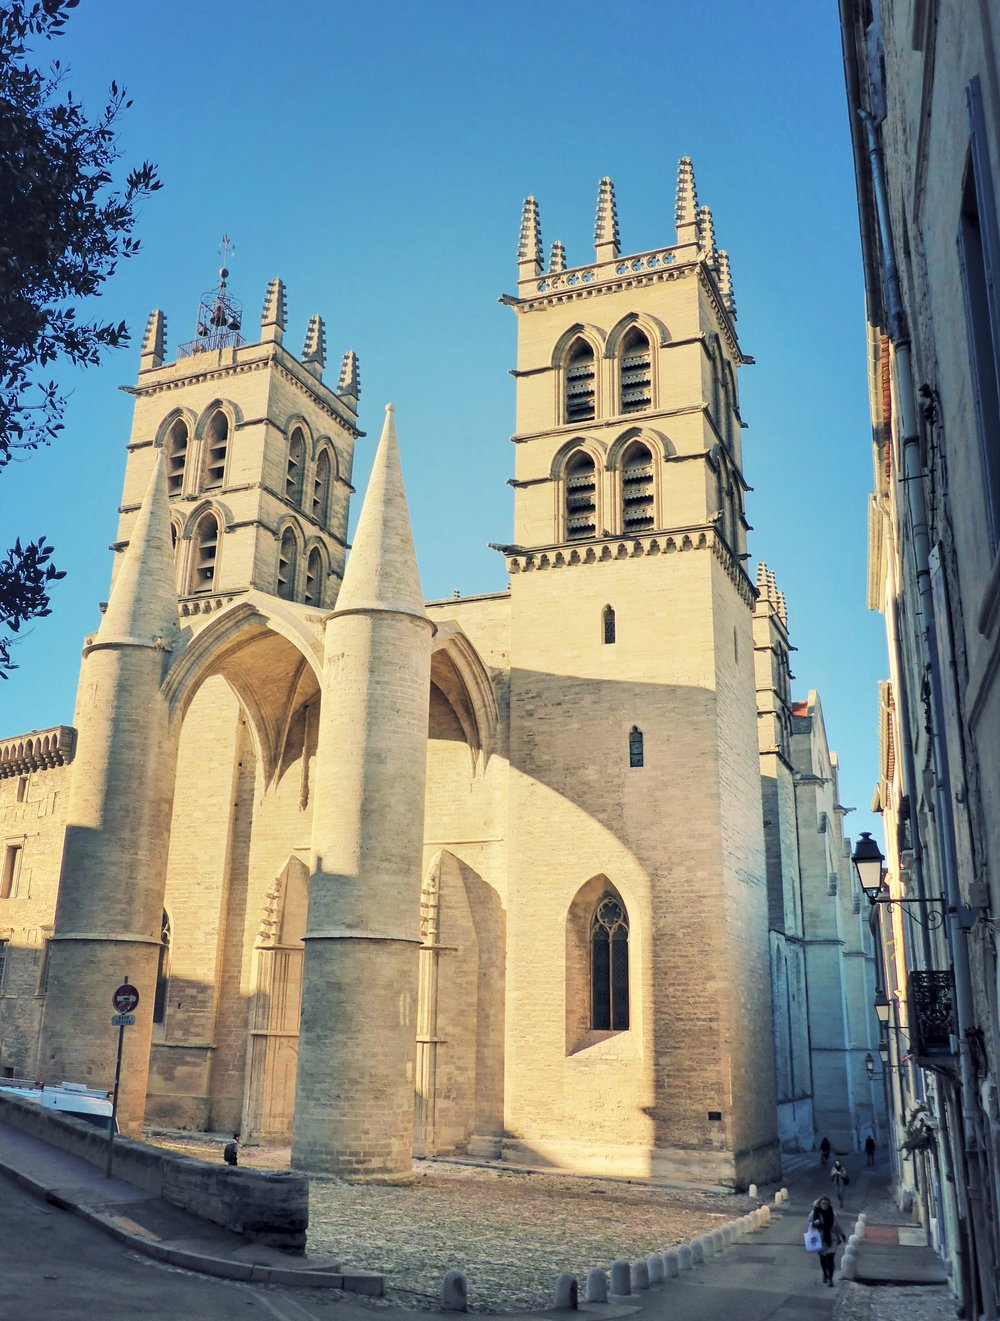 Saint Pierre 's Cathedrale